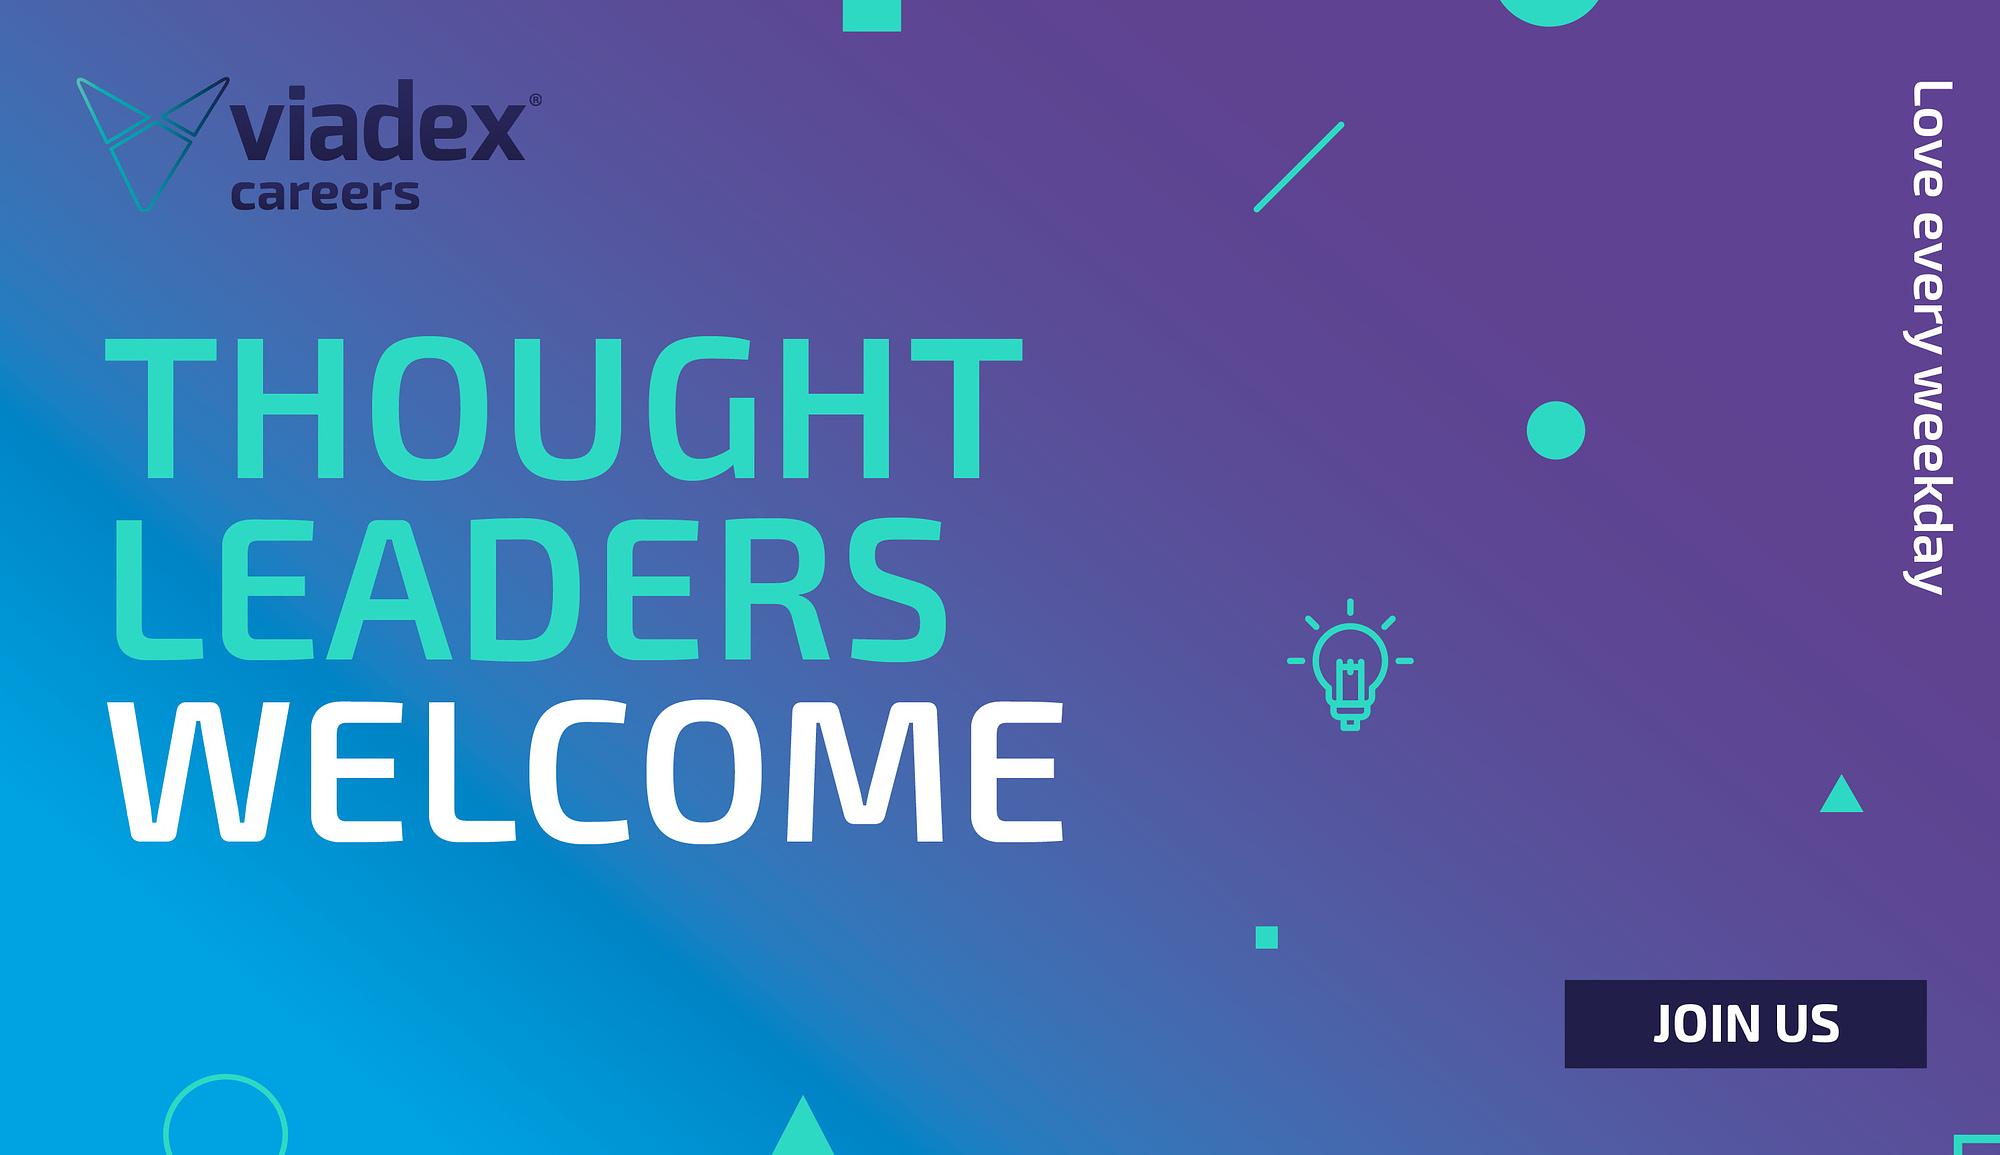 Viadex digital advert